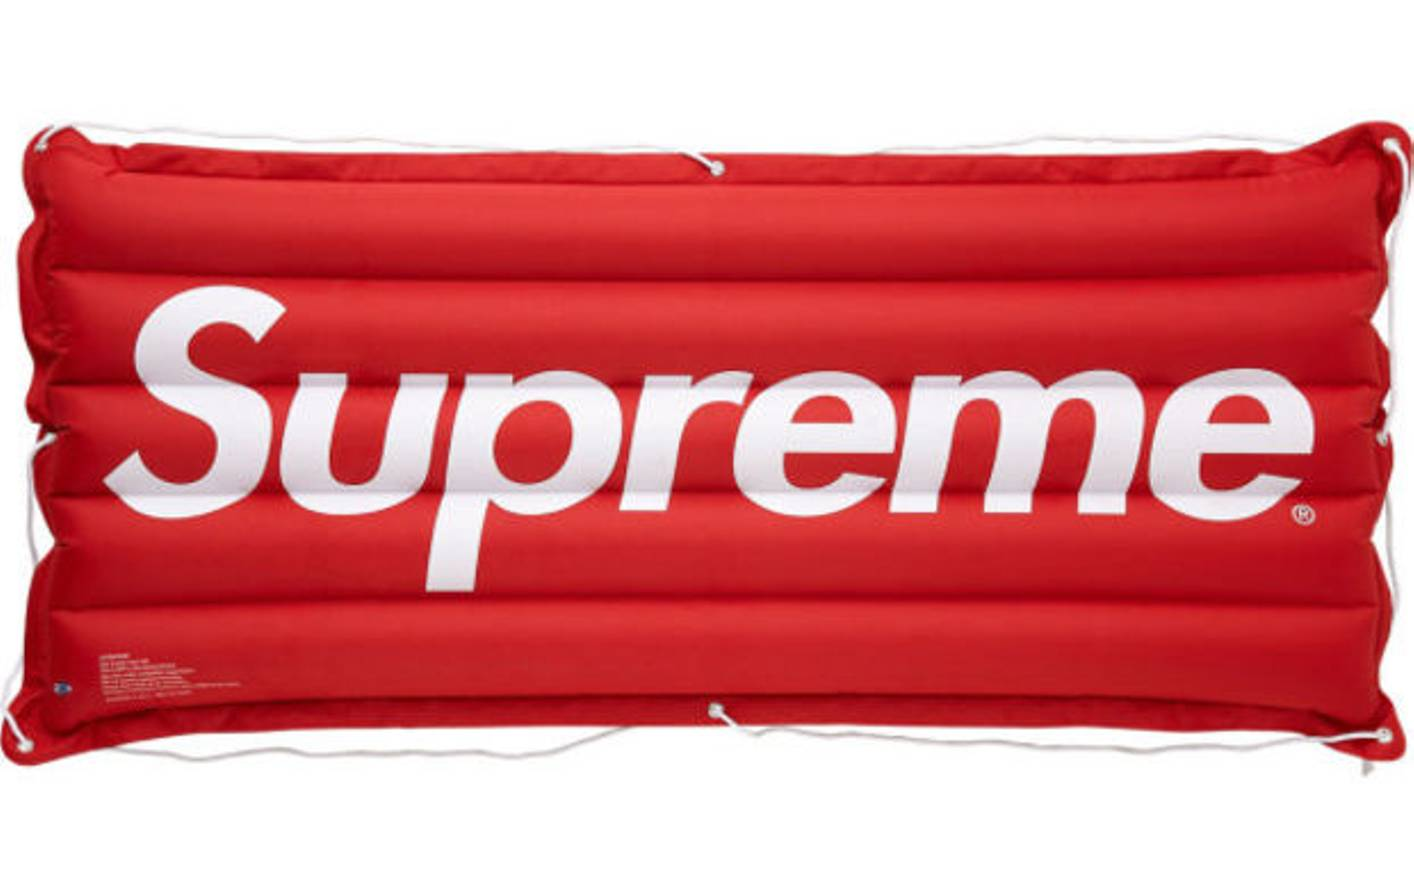 Weird Supreme Items